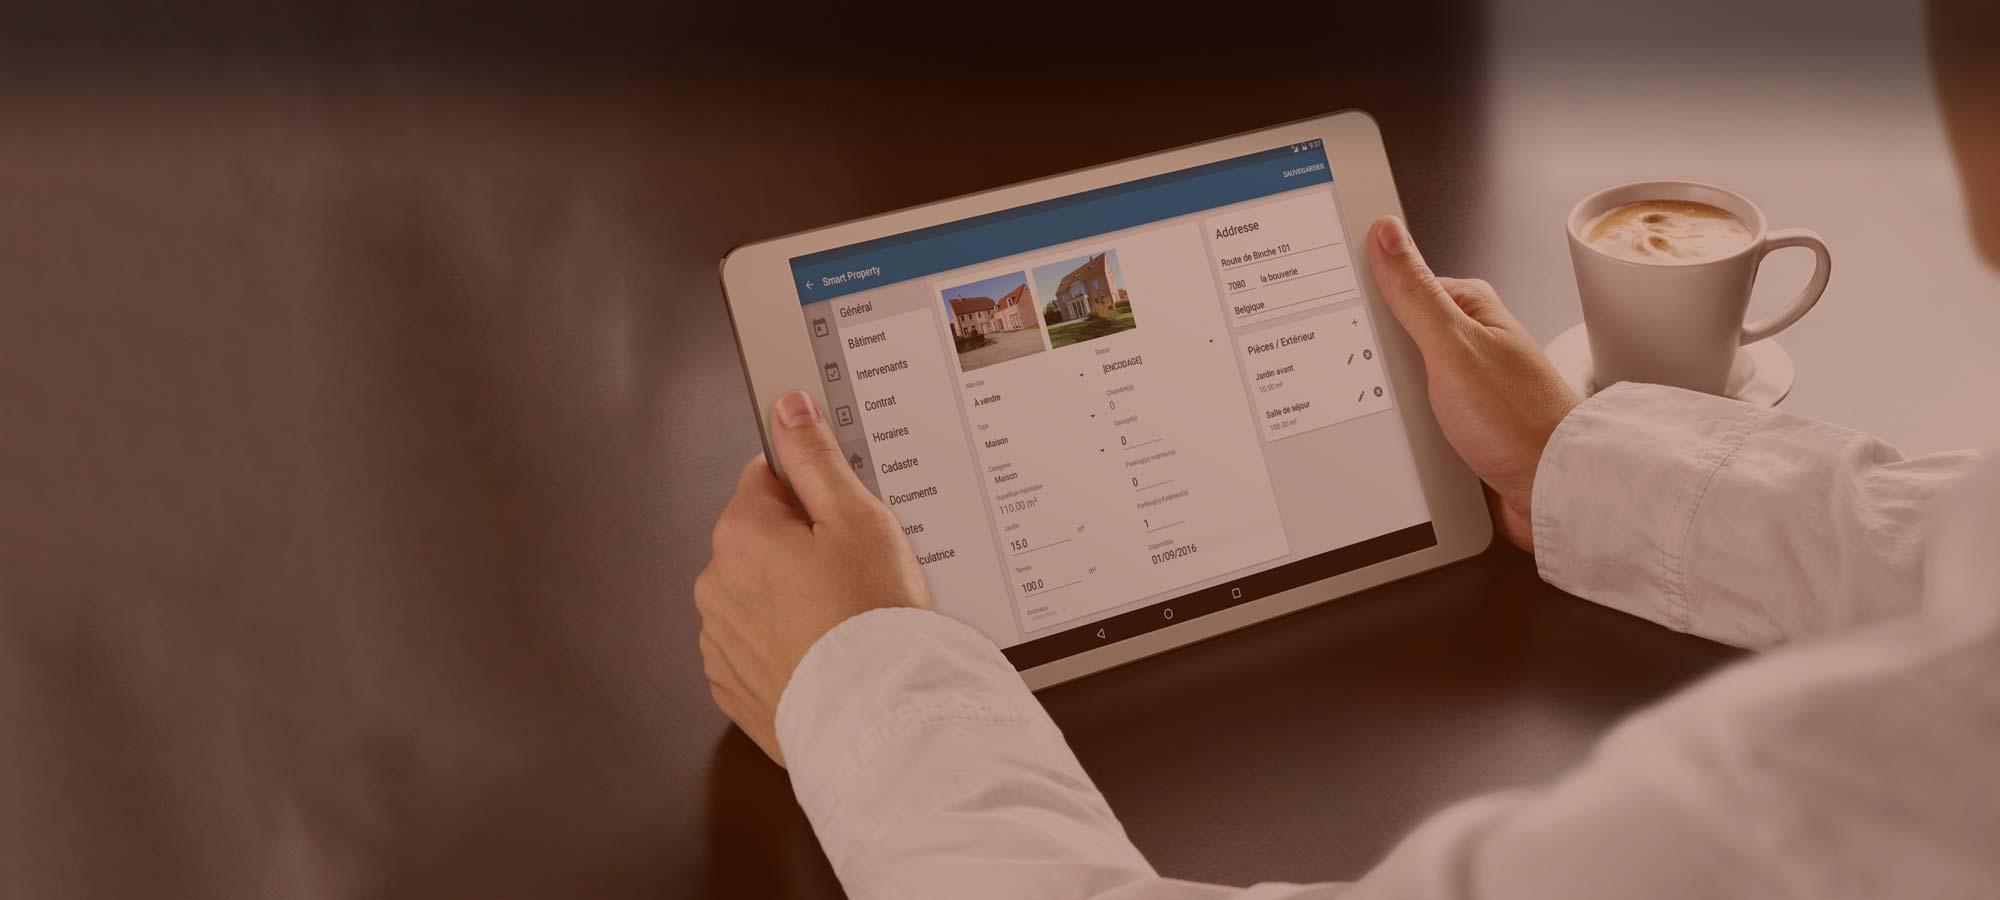 SMART REA (Real Estate Agency)